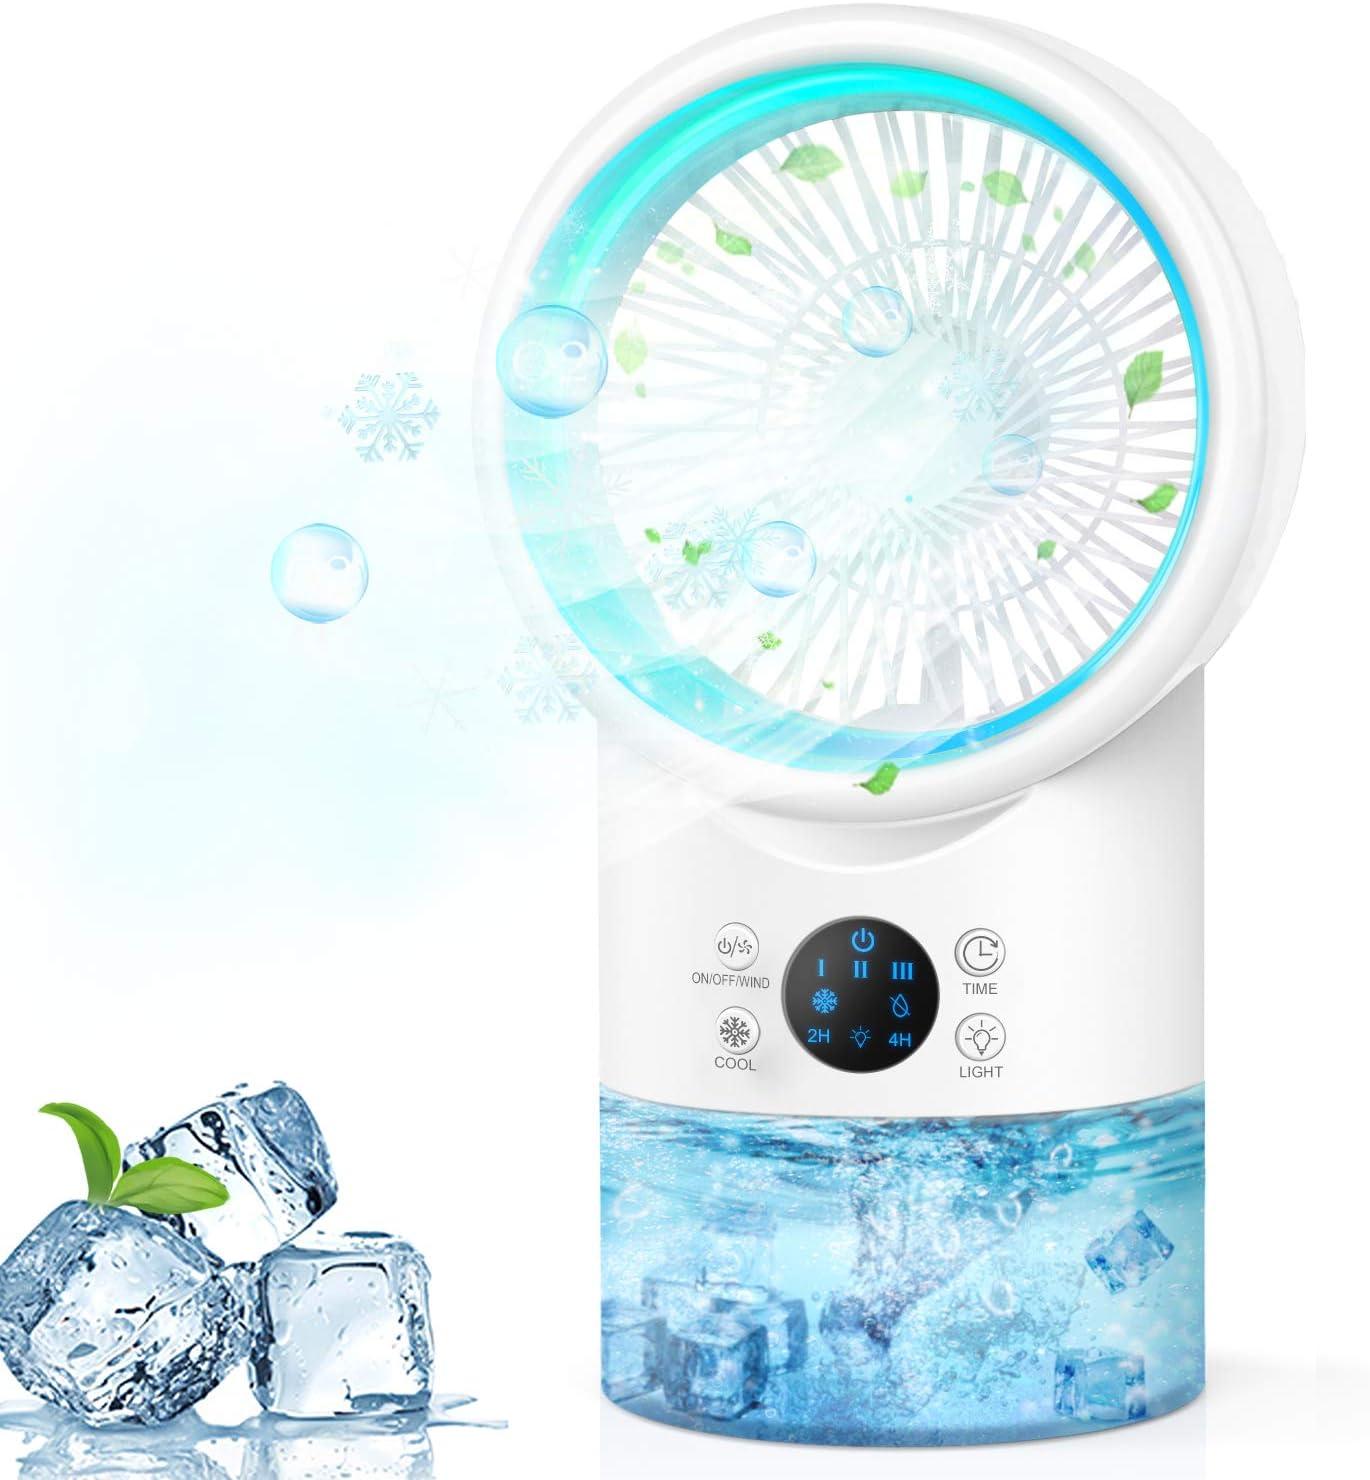 USB Evaporative Portable Air Conditioner Air Cooler Fan Mini Air Conditioner Topteng Air Conditioner Fan